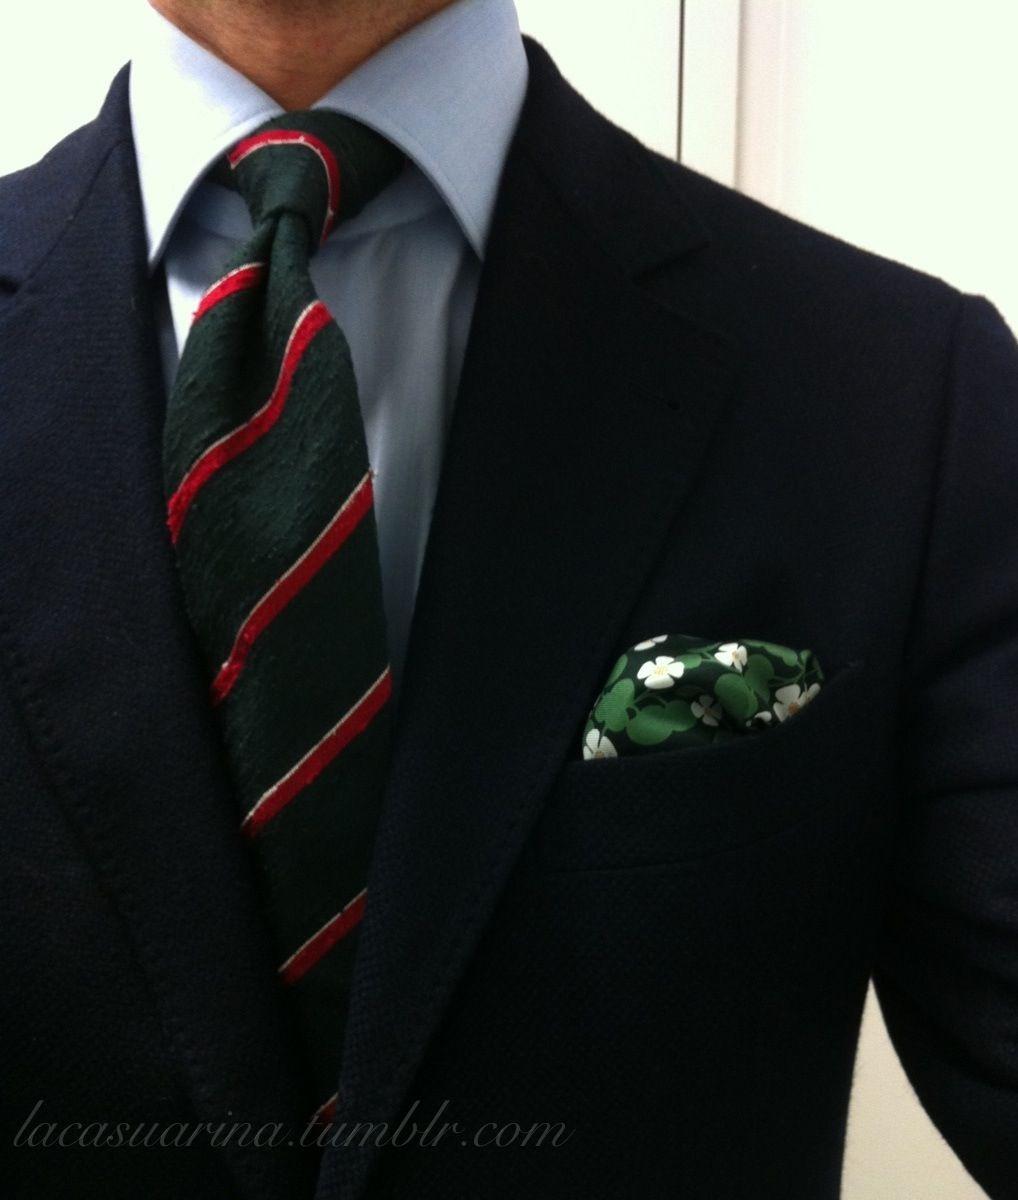 Faça seu estilo no Atelier das Gravatas - atelierdasgravatatas.com.br ...  Luck.